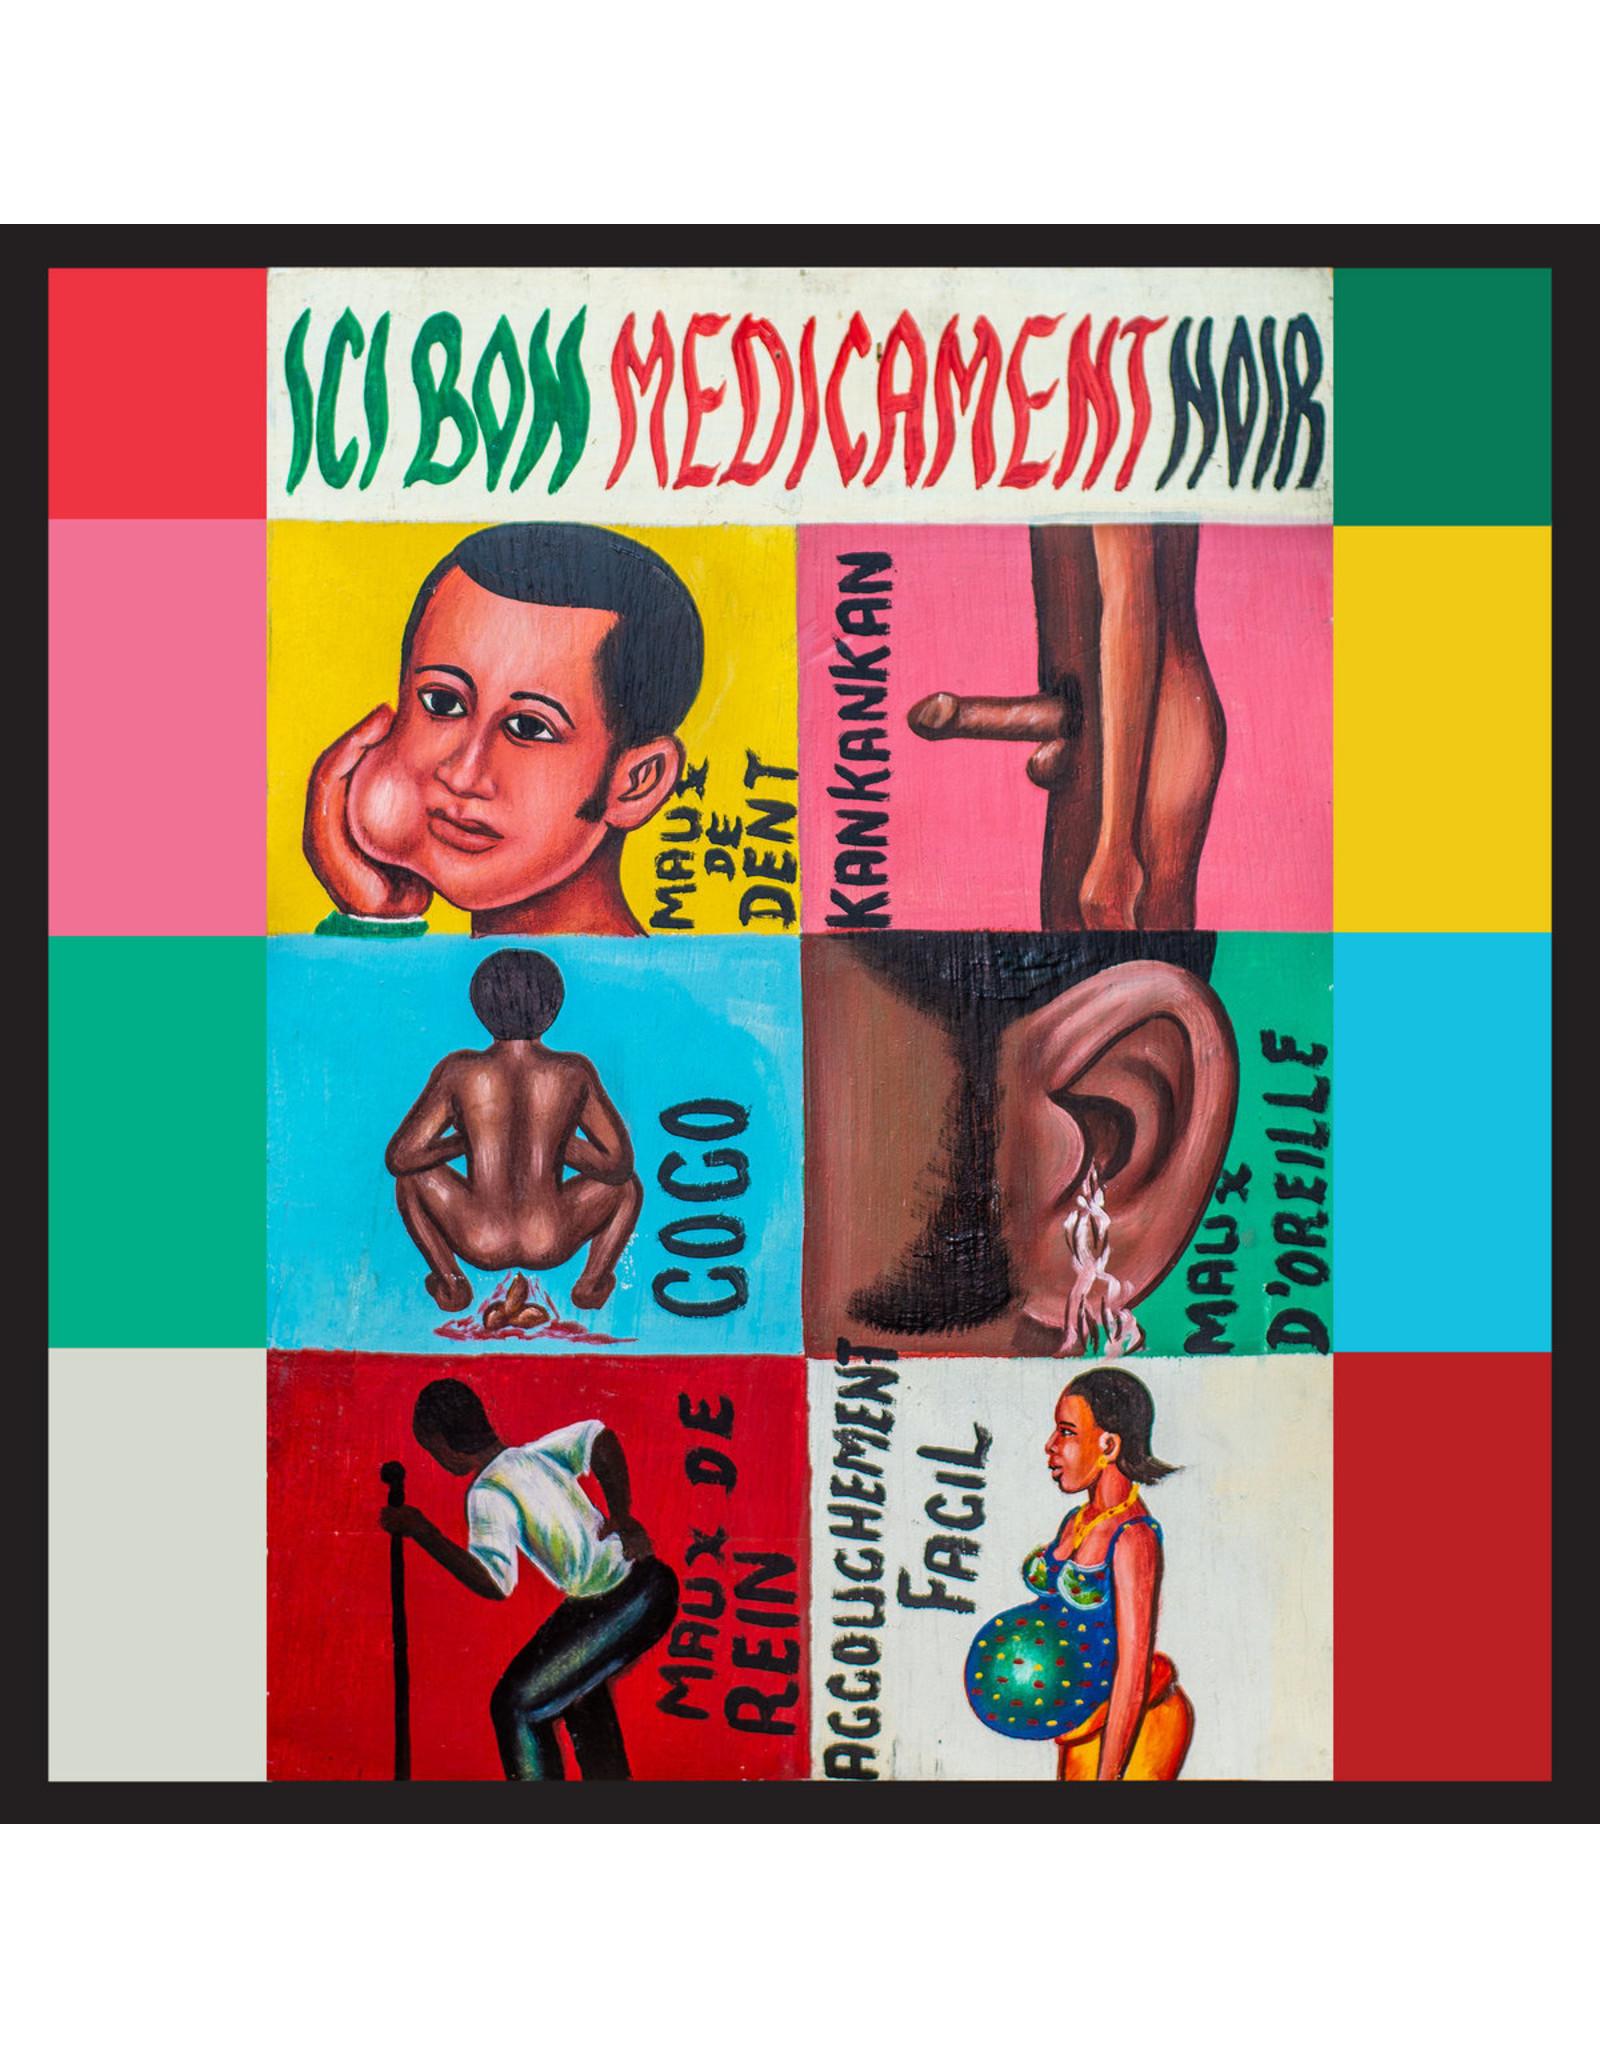 New Vinyl Mr Entertainment & The Pookiesmackers - Good Black Medicine Here LP